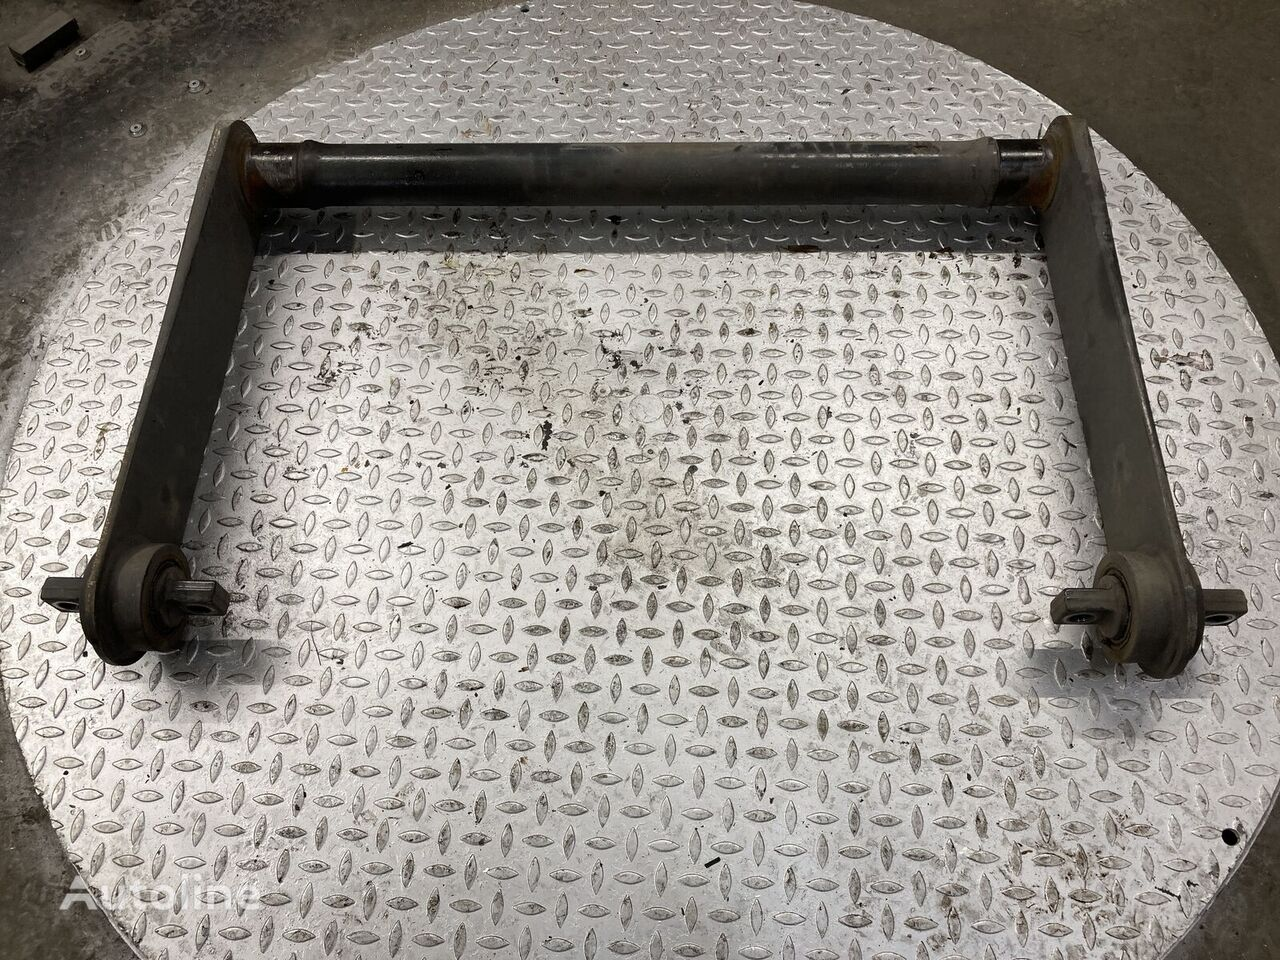 резервни части  Torsiestaaf achteras за камион MERCEDES-BENZ Torsiestaaf achteras